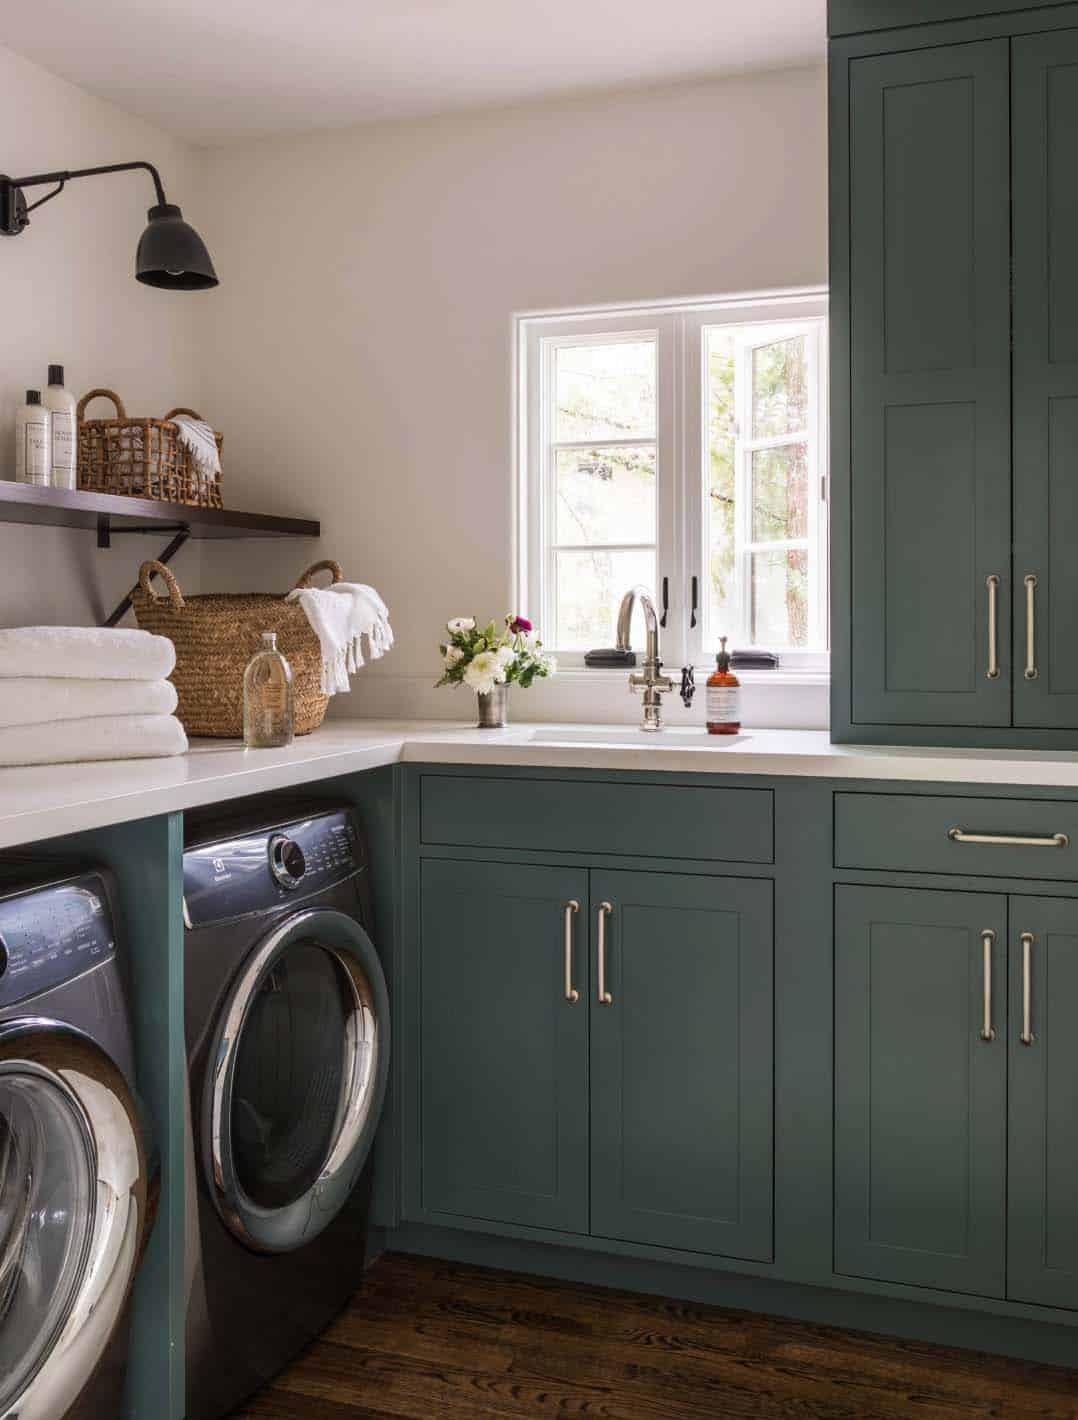 Mediterranean Style Home-Jute Interior Design-09-1 Kindesign